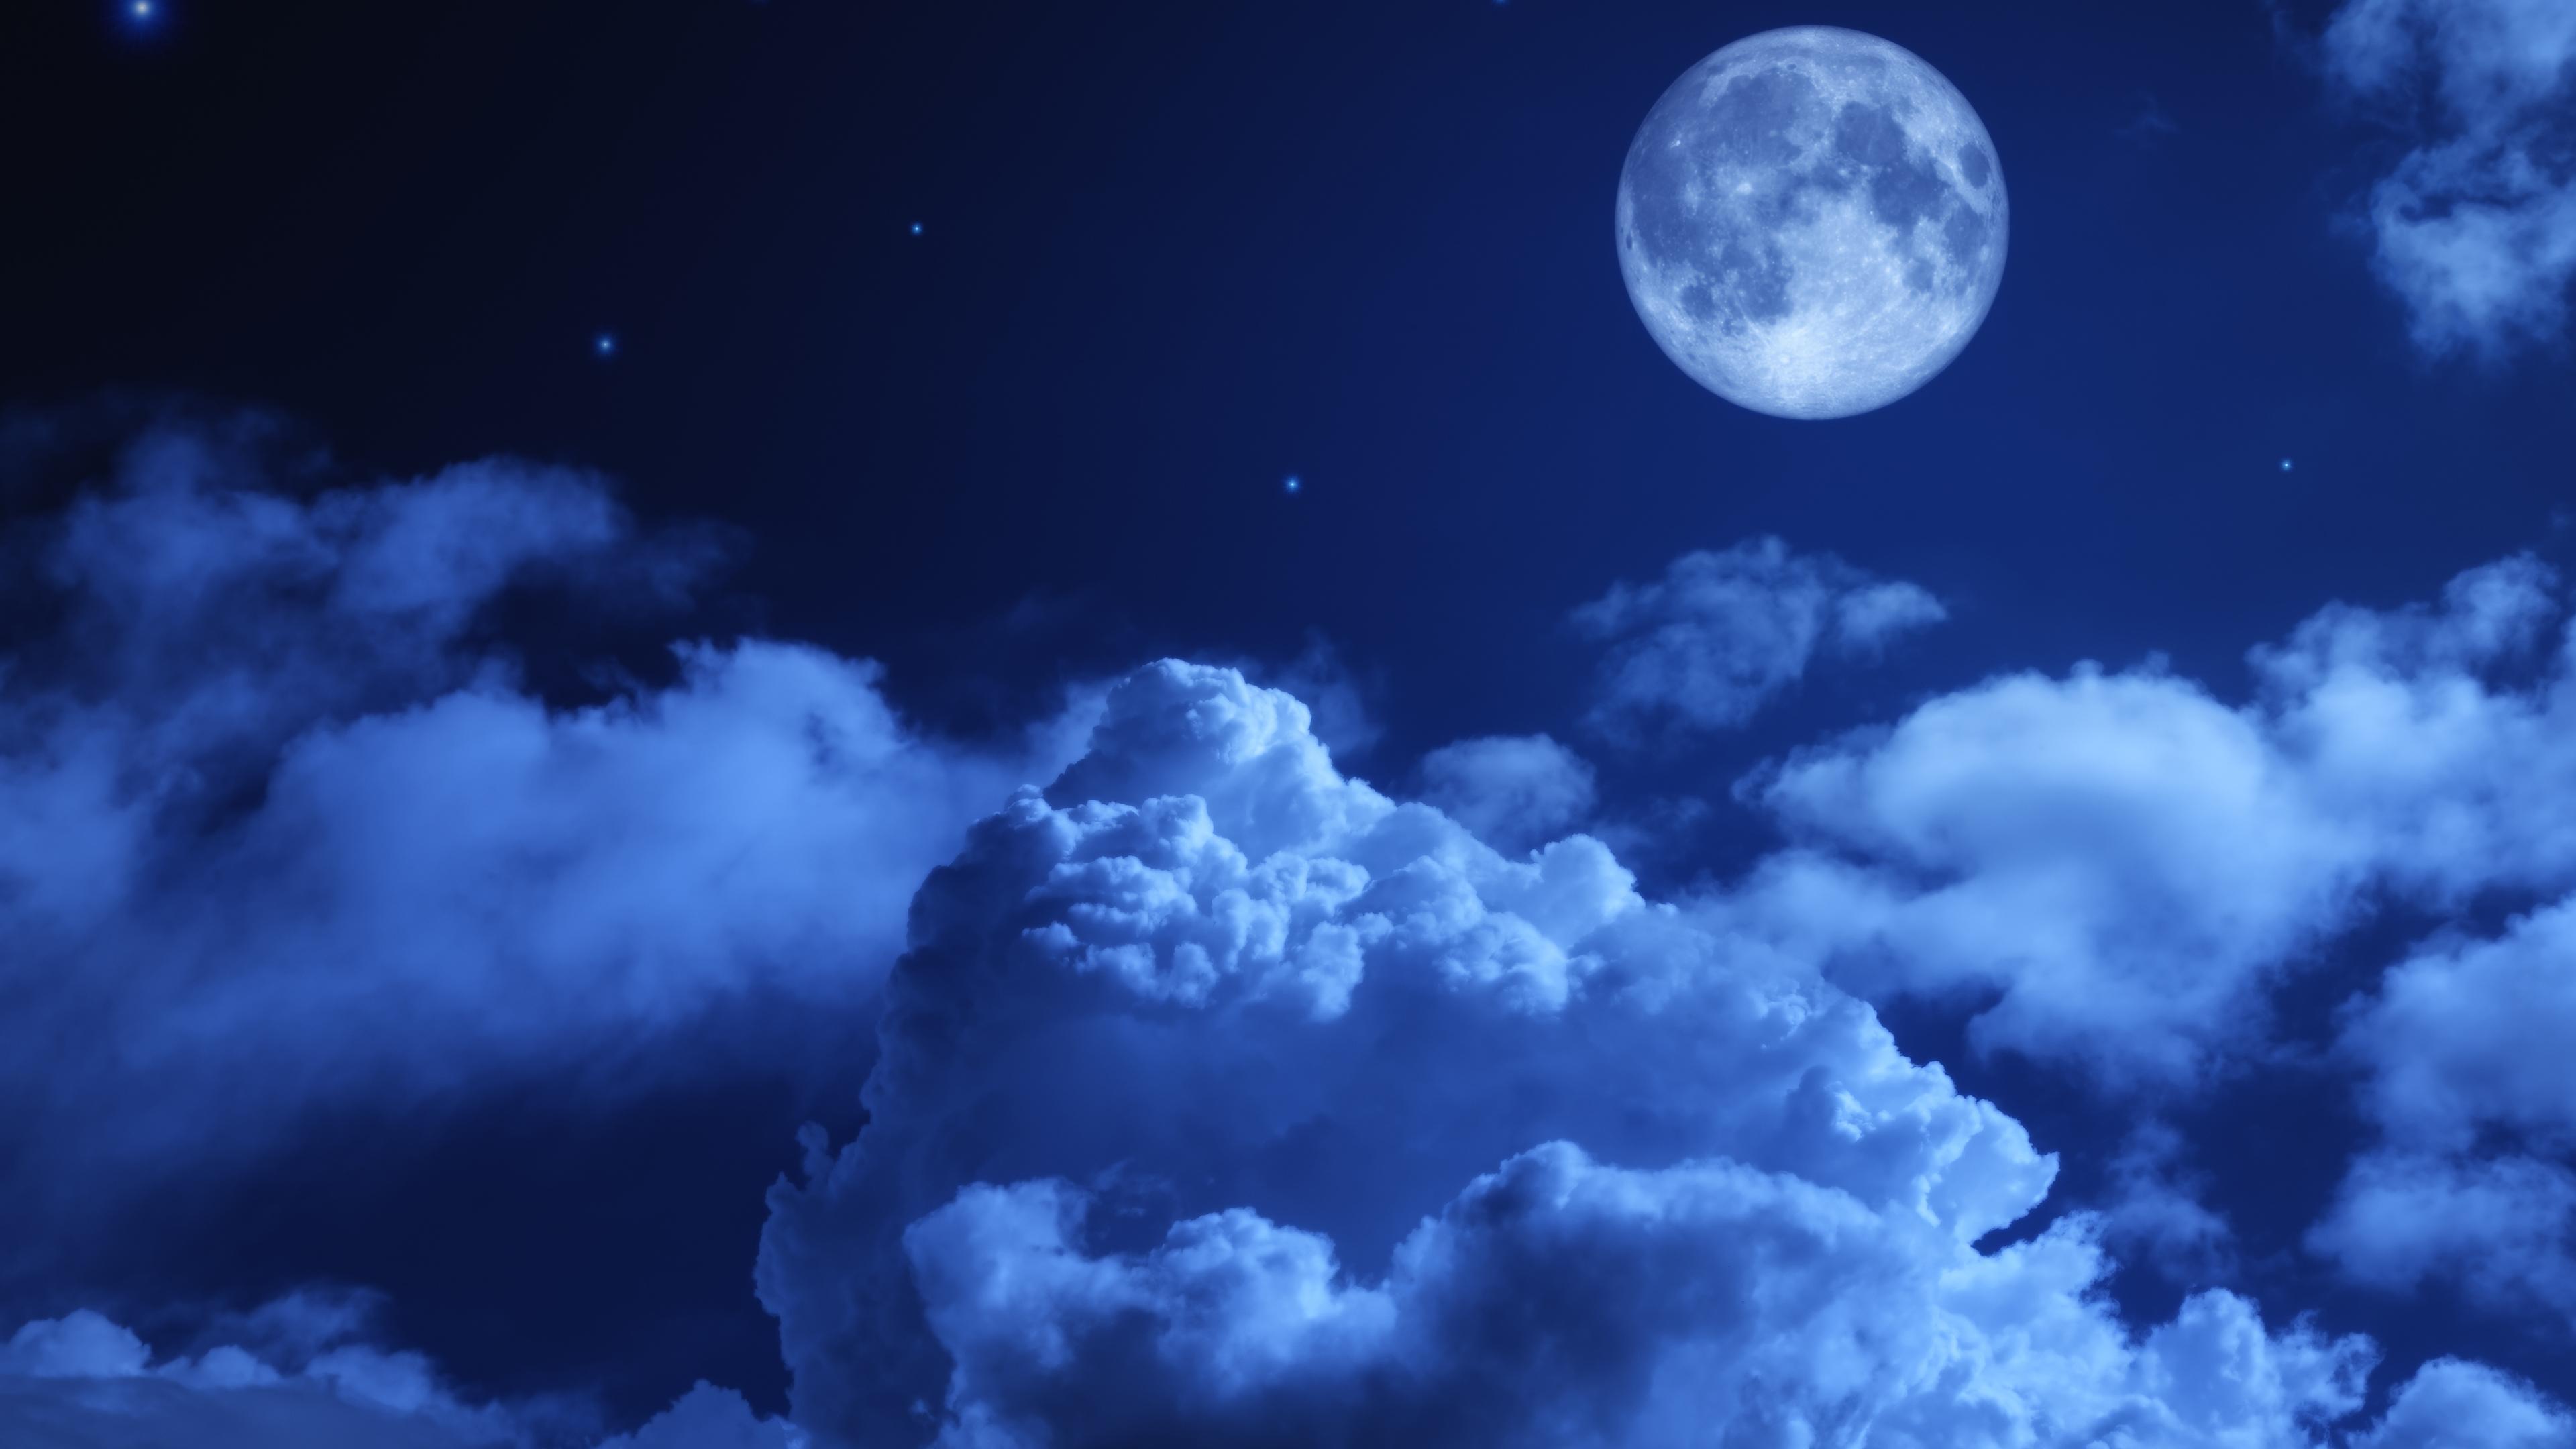 moon night sky clouds 4k 1540136749 - Moon Night Sky Clouds 4k - sky wallpapers, night wallpapers, moon wallpapers, hd-wallpapers, clouds wallpapers, 5k wallpapers, 4k-wallpapers